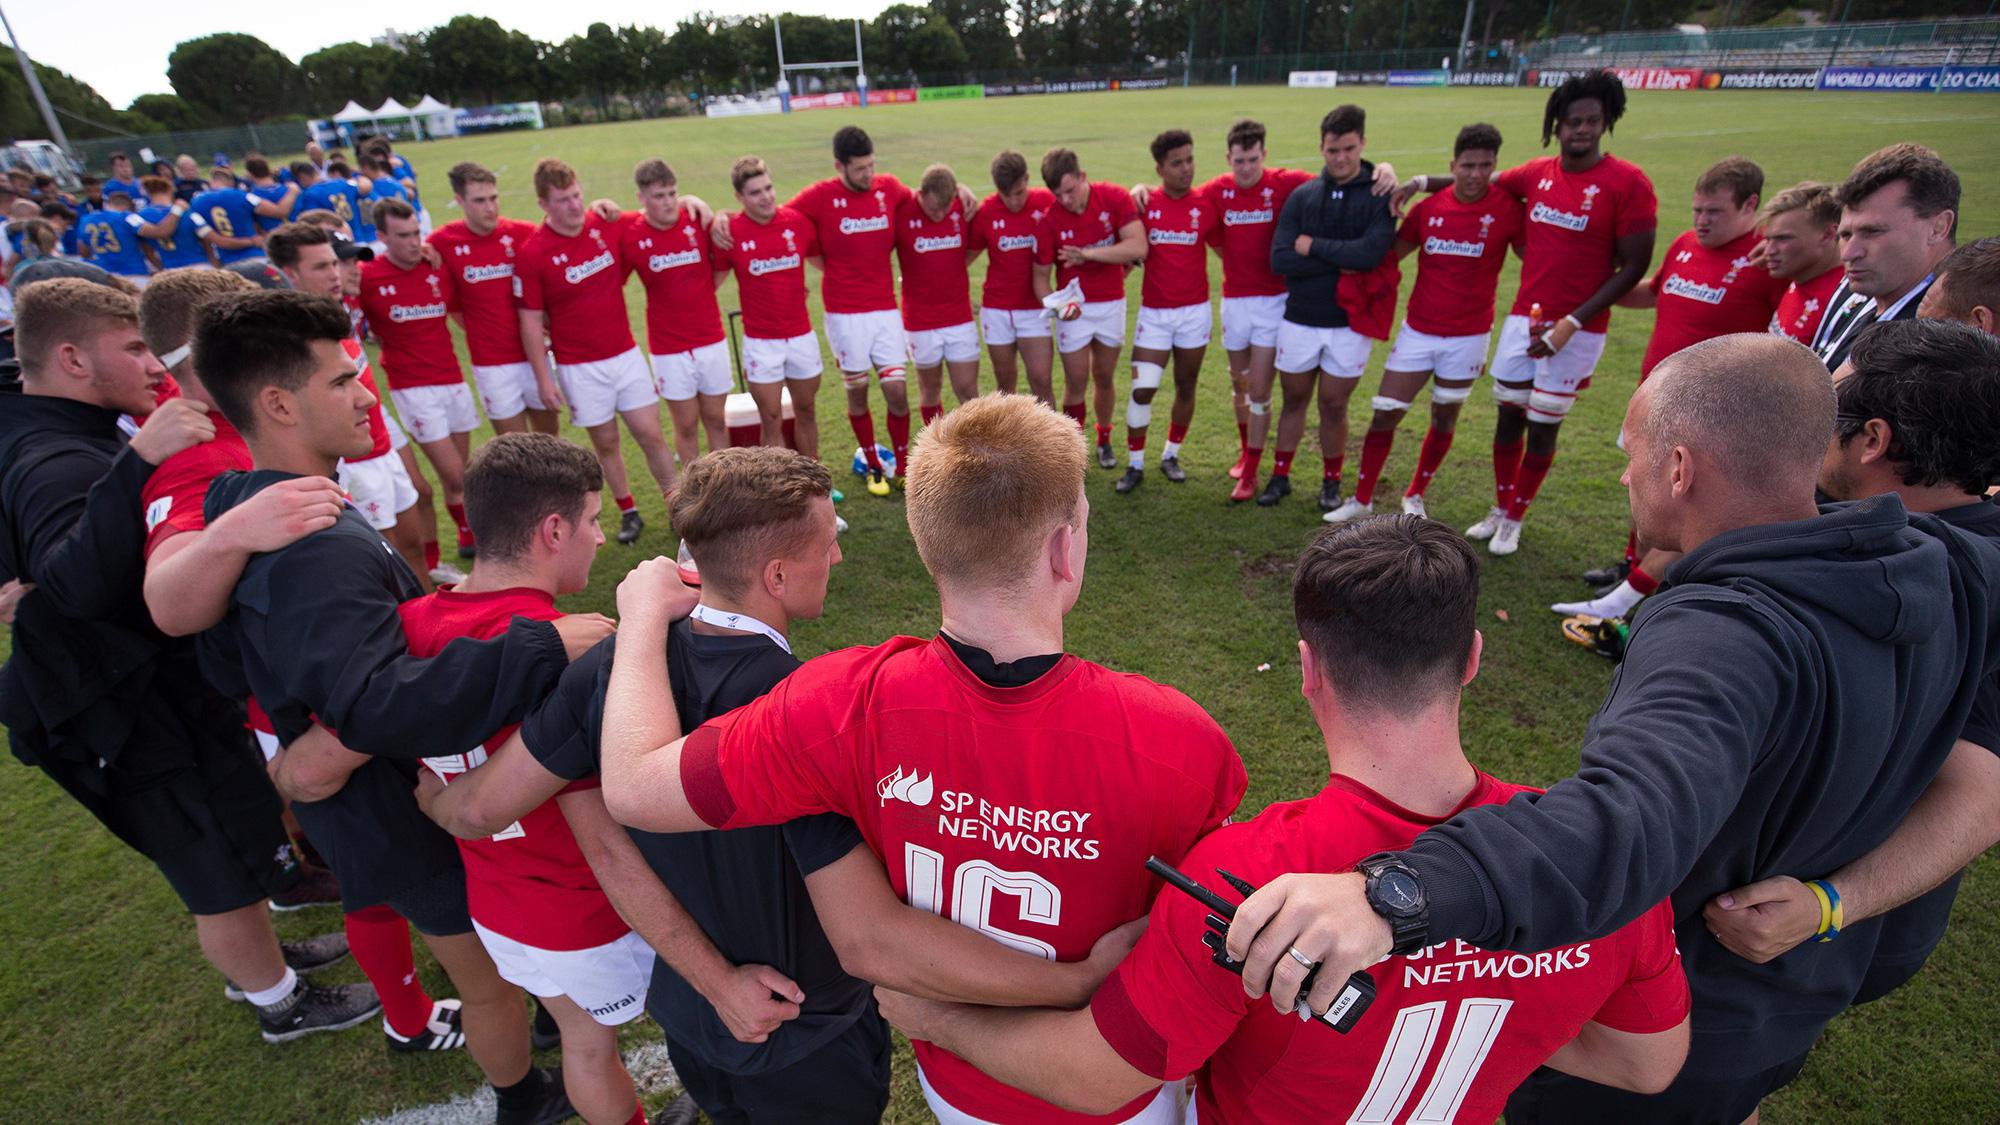 Welsh Rugby Union   Wales & Regions   Wales U20 News